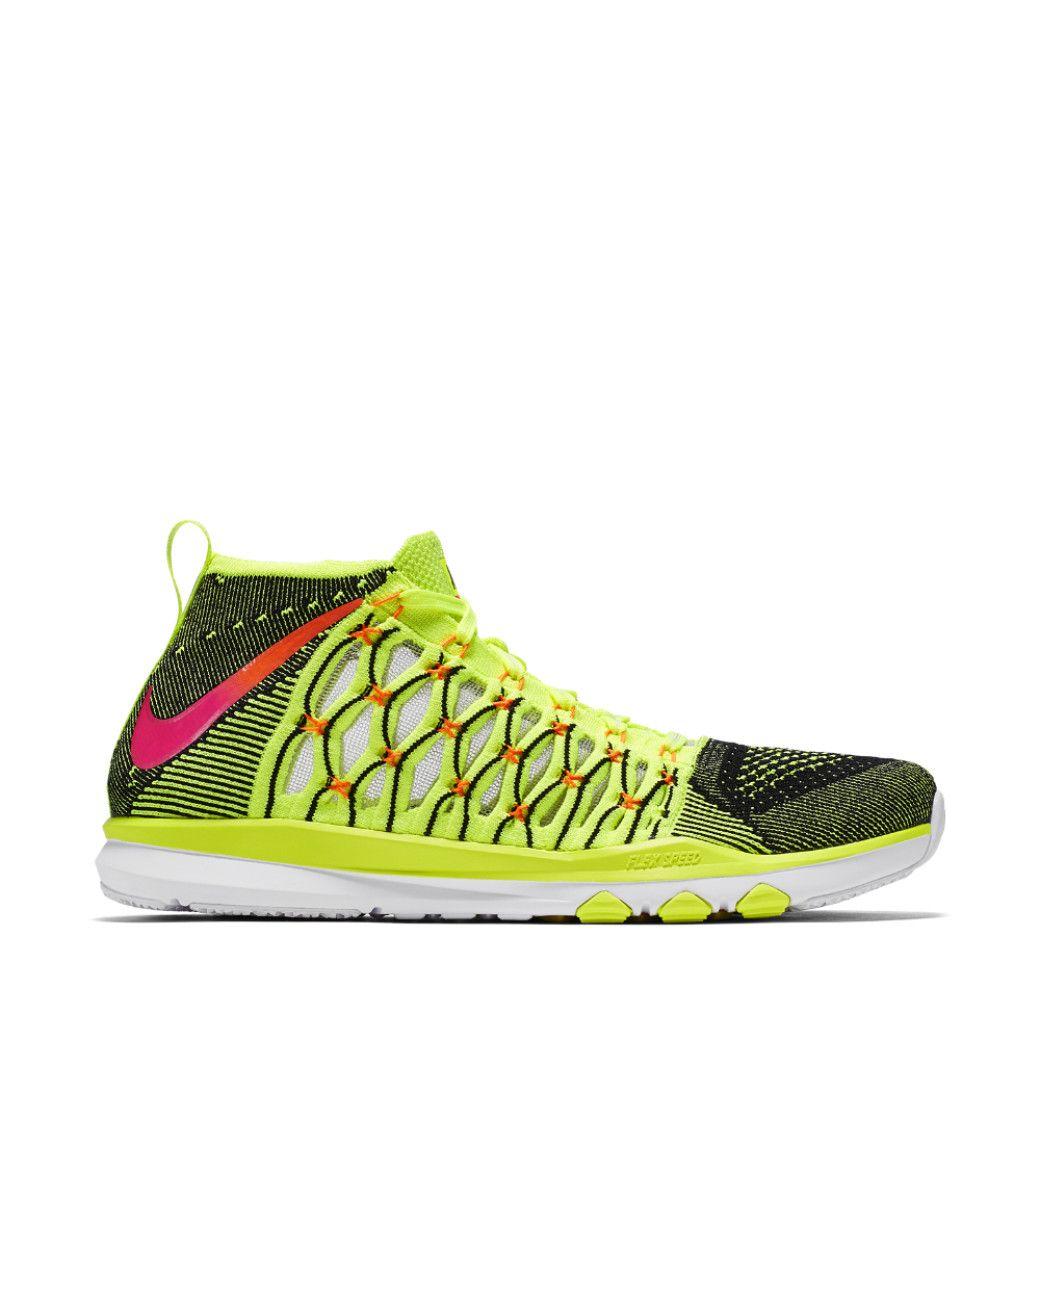 2b27b06f3b2fe Train Ultrafast Flyknit Men s Training Shoe